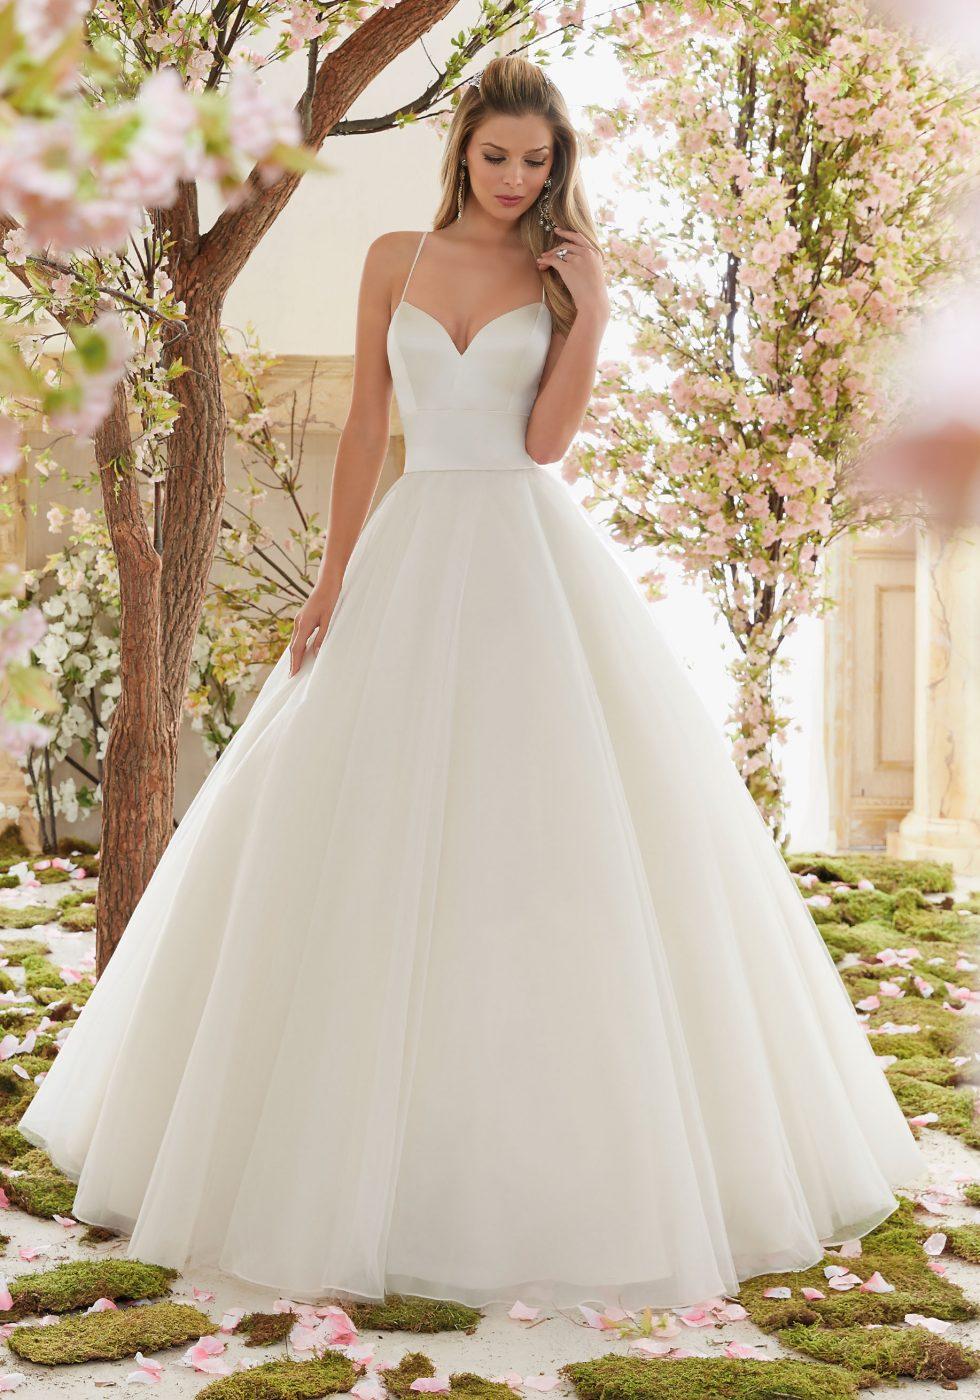 Kyna consigli dresses for wedding